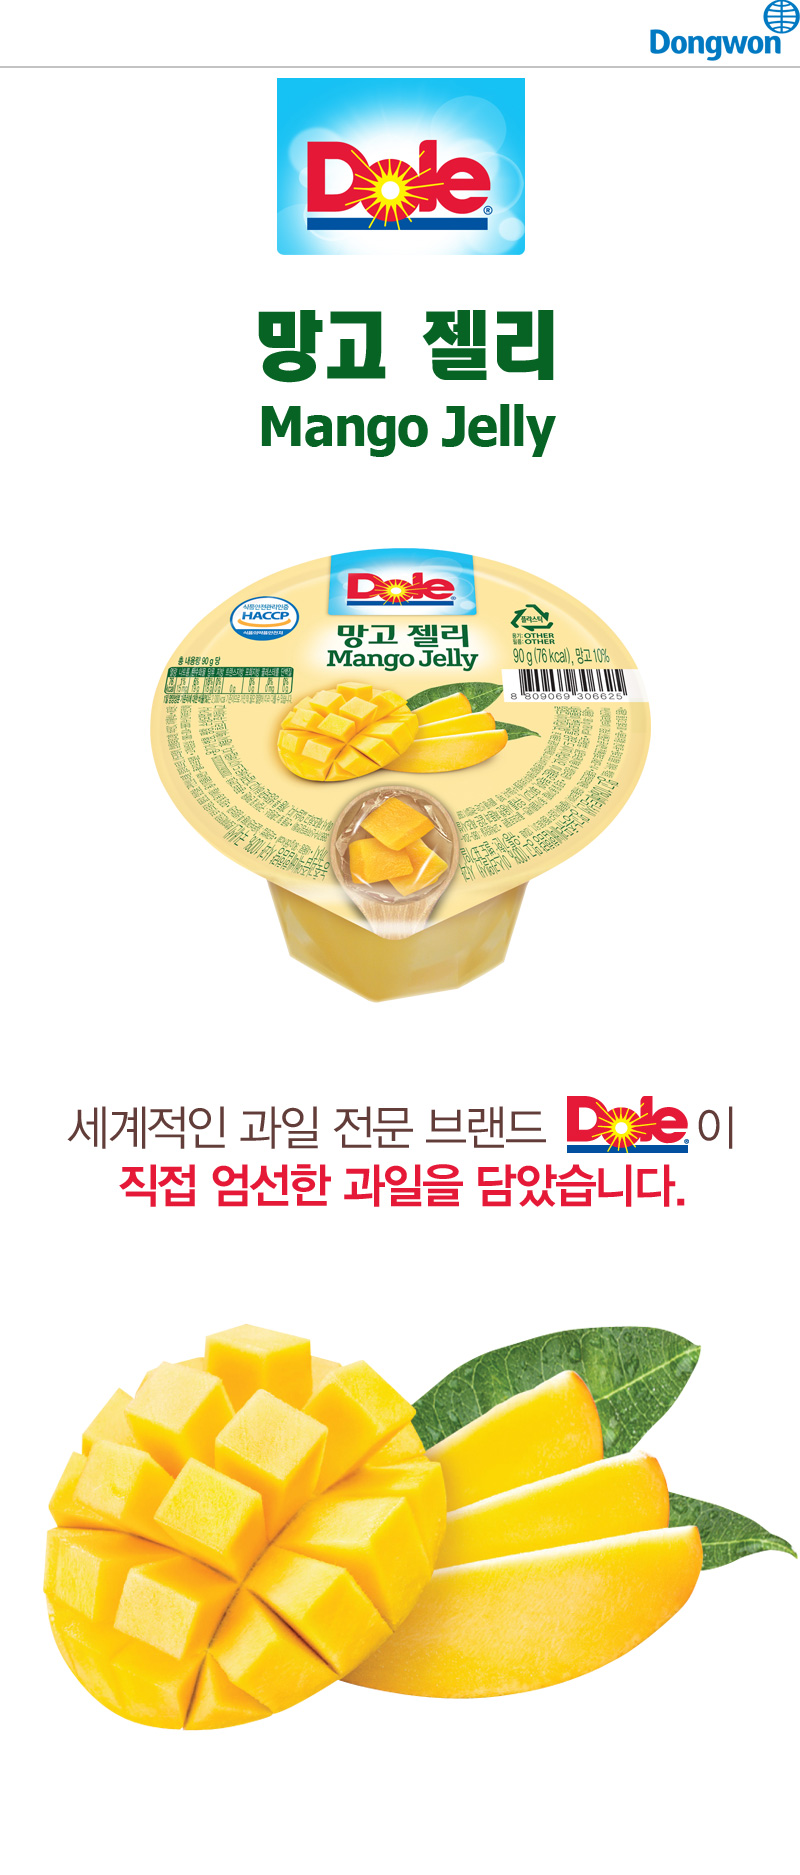 Dole 망고 젤리 Mango Jelly 세계적인 과일 전문 브랜드 Dole이 직접 엄선한 과일을 담았습니다.